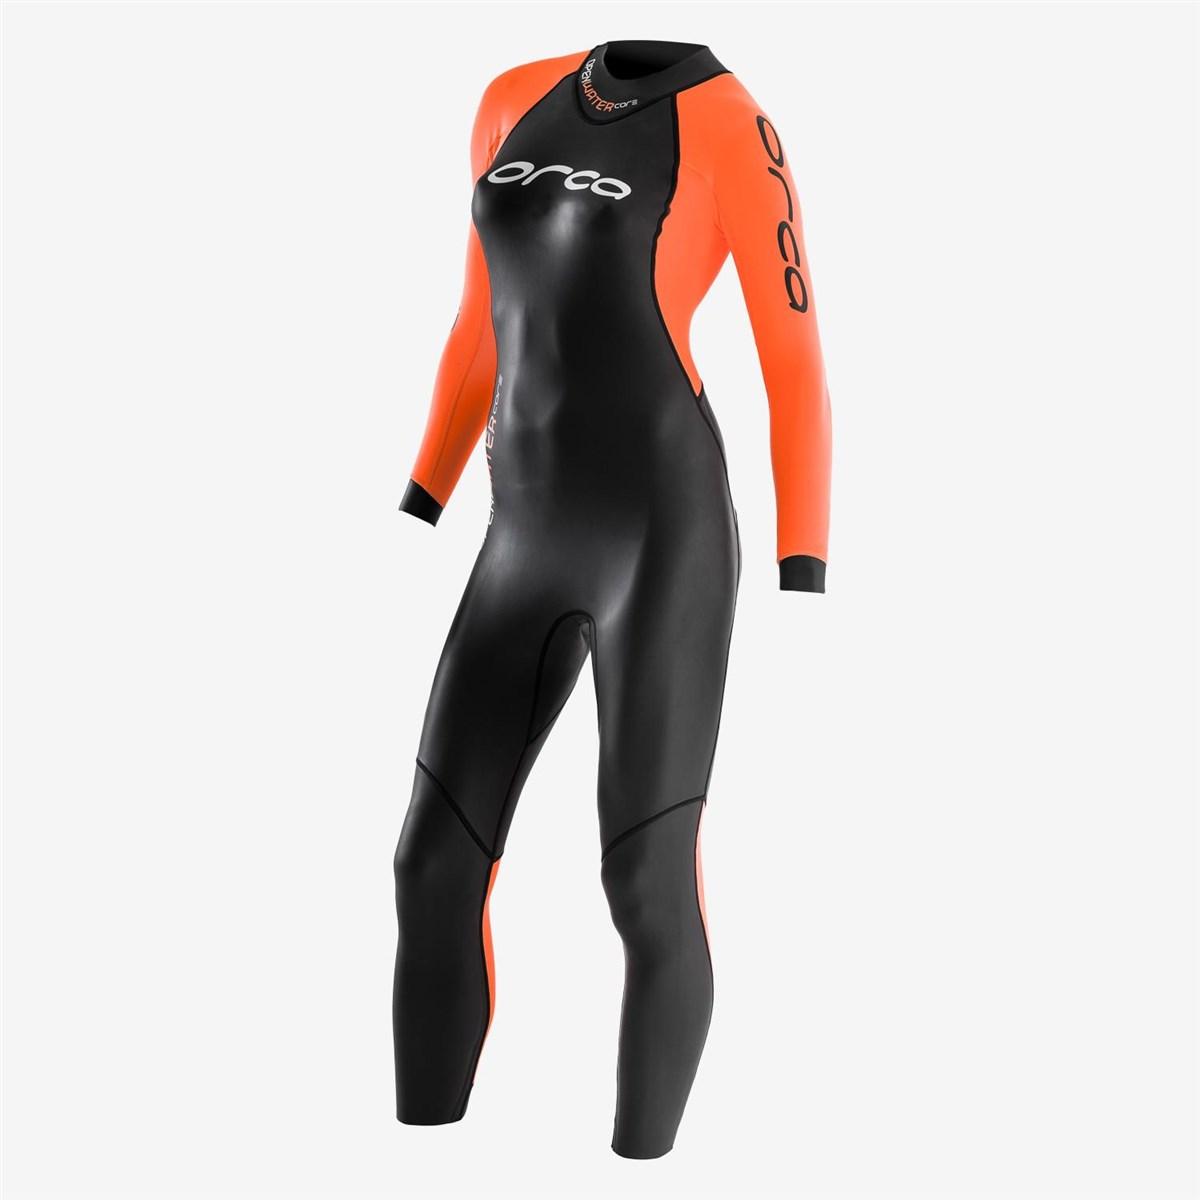 Orca Openwater One Piece Womens Triathlon Wetsuit | Tri-beklædning